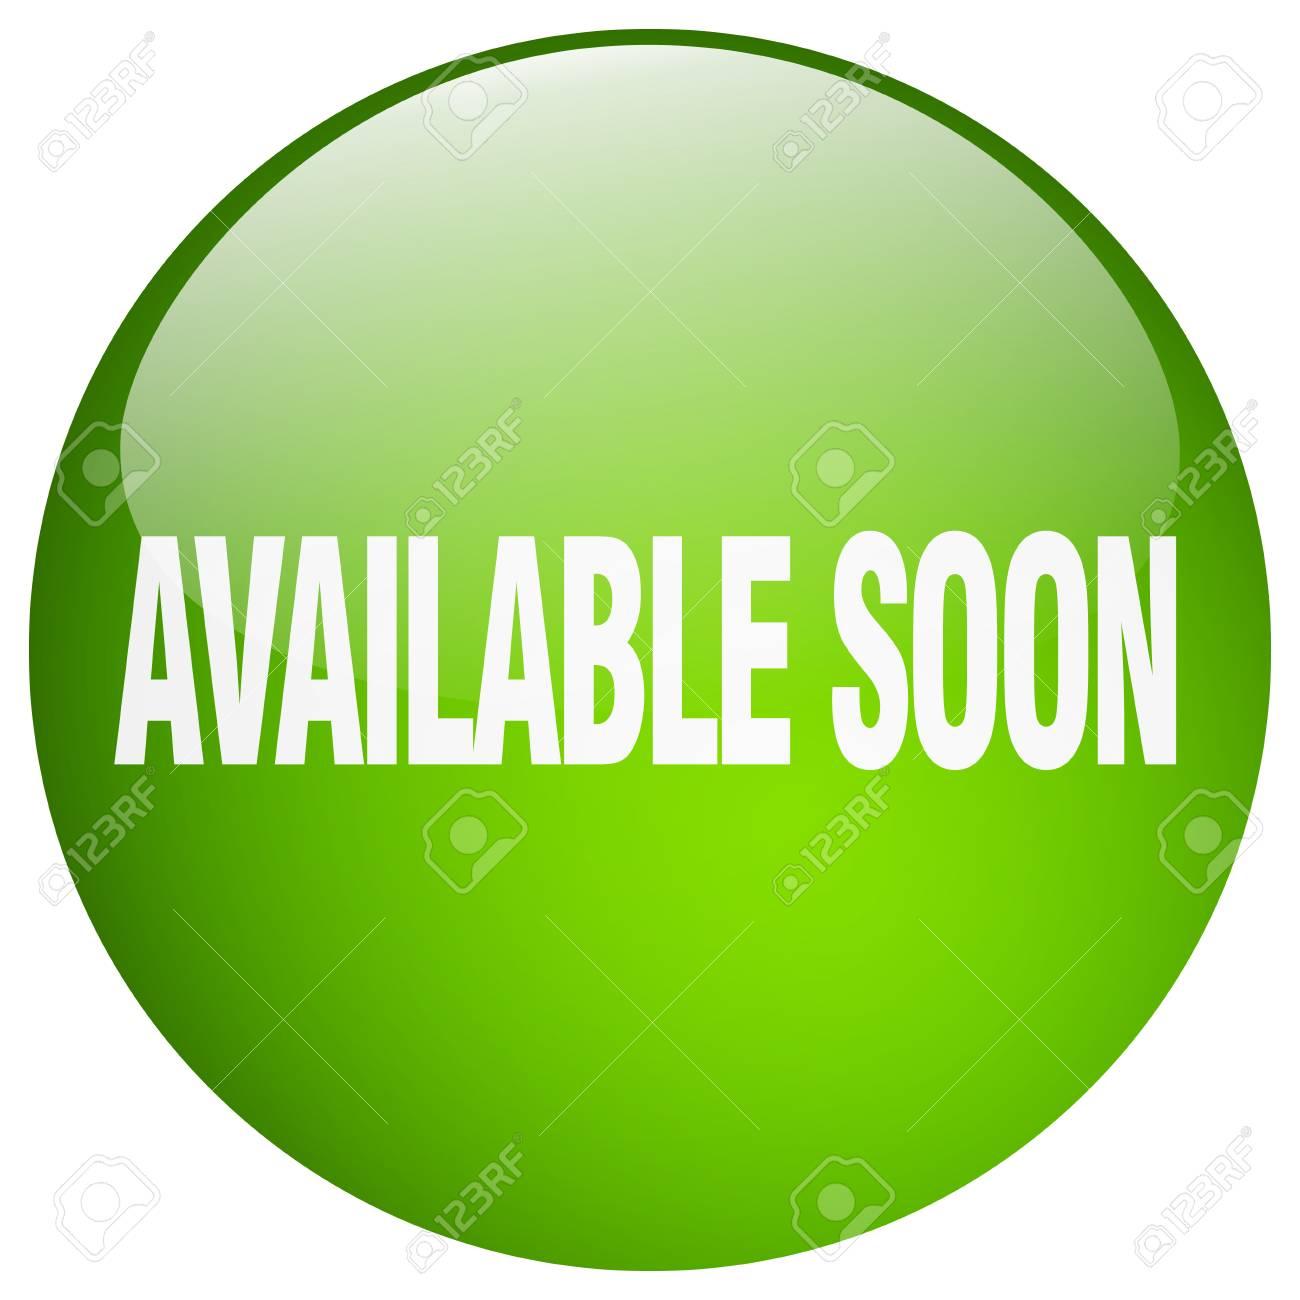 26129c4560a637 Binnenkort beschikbaar groene ronde geïsoleerd gel drukknop Stockfoto -  49082962